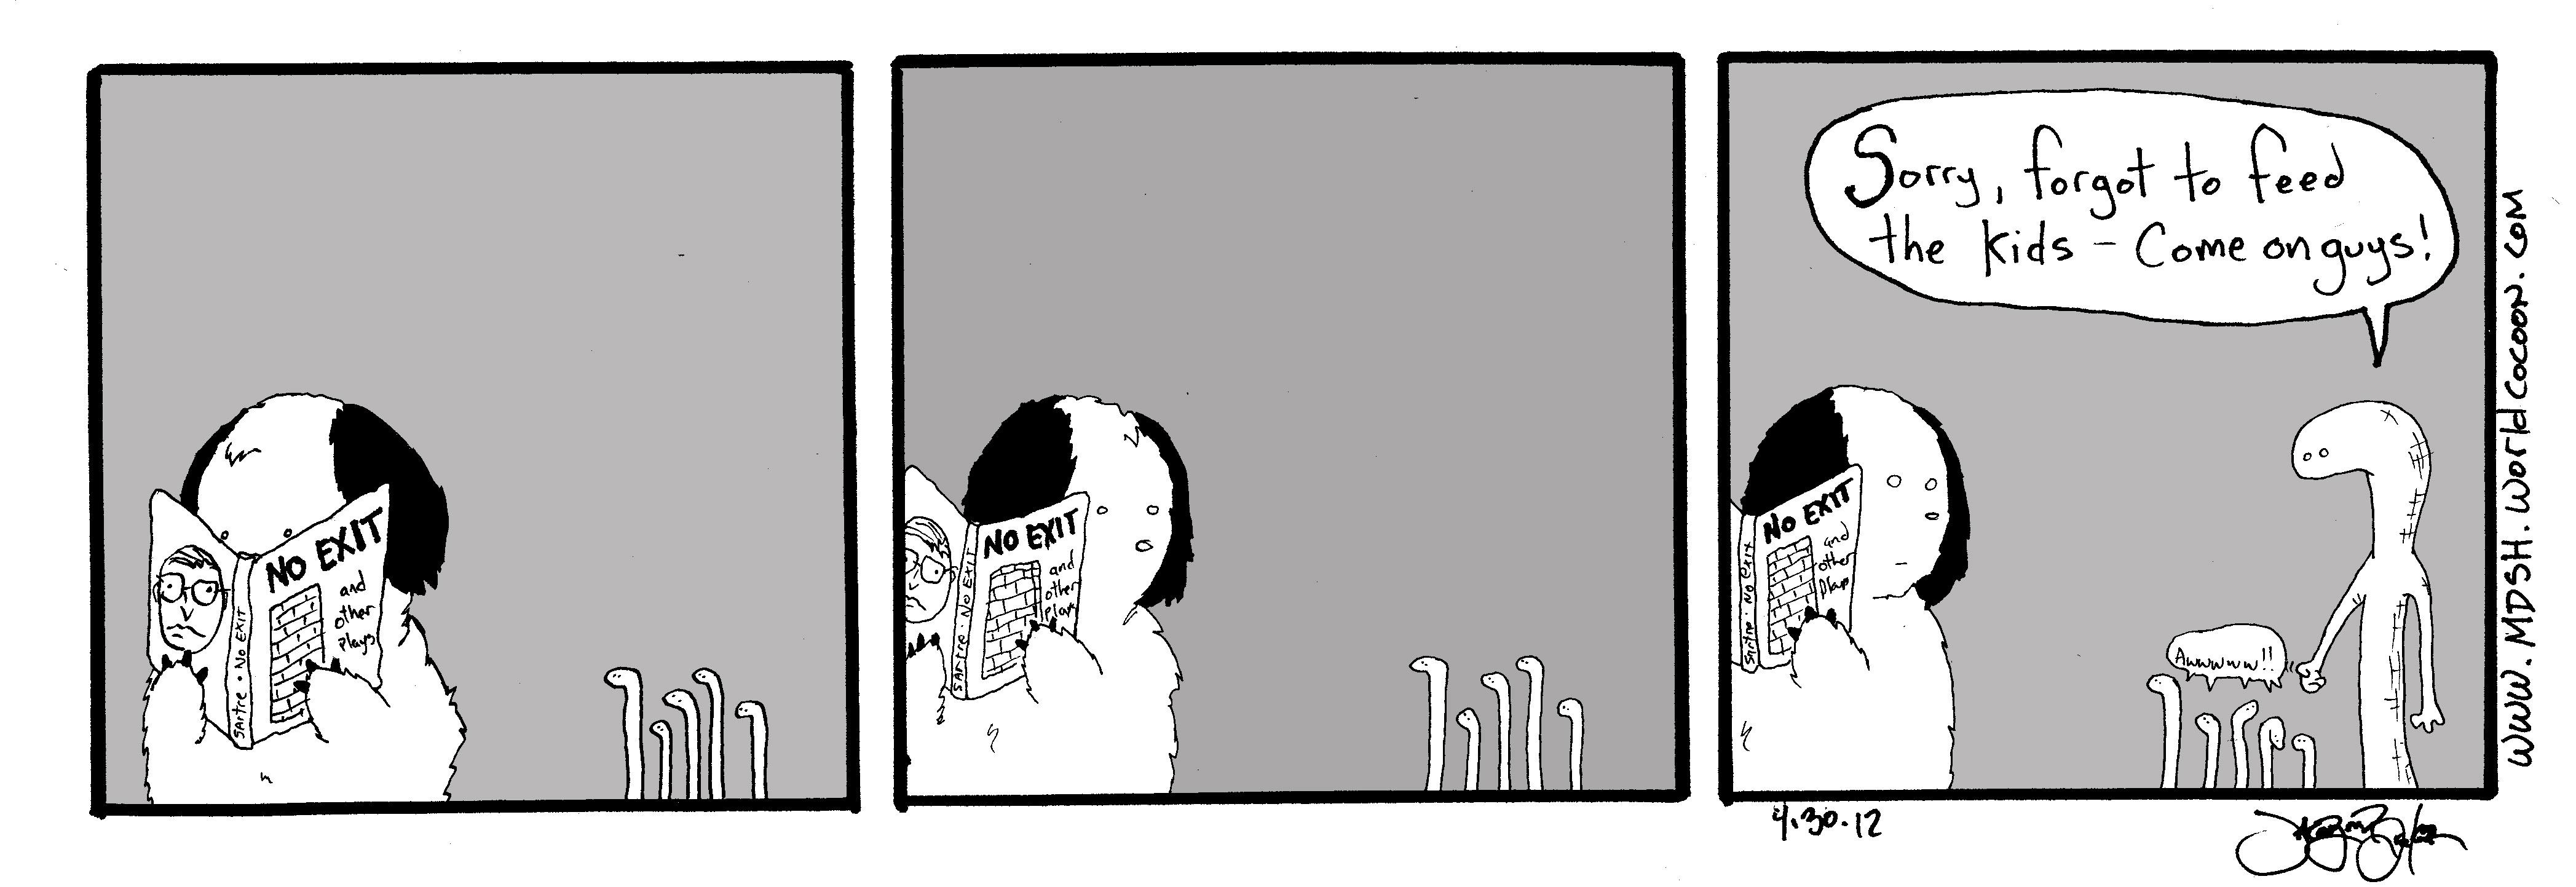 04/30/2012